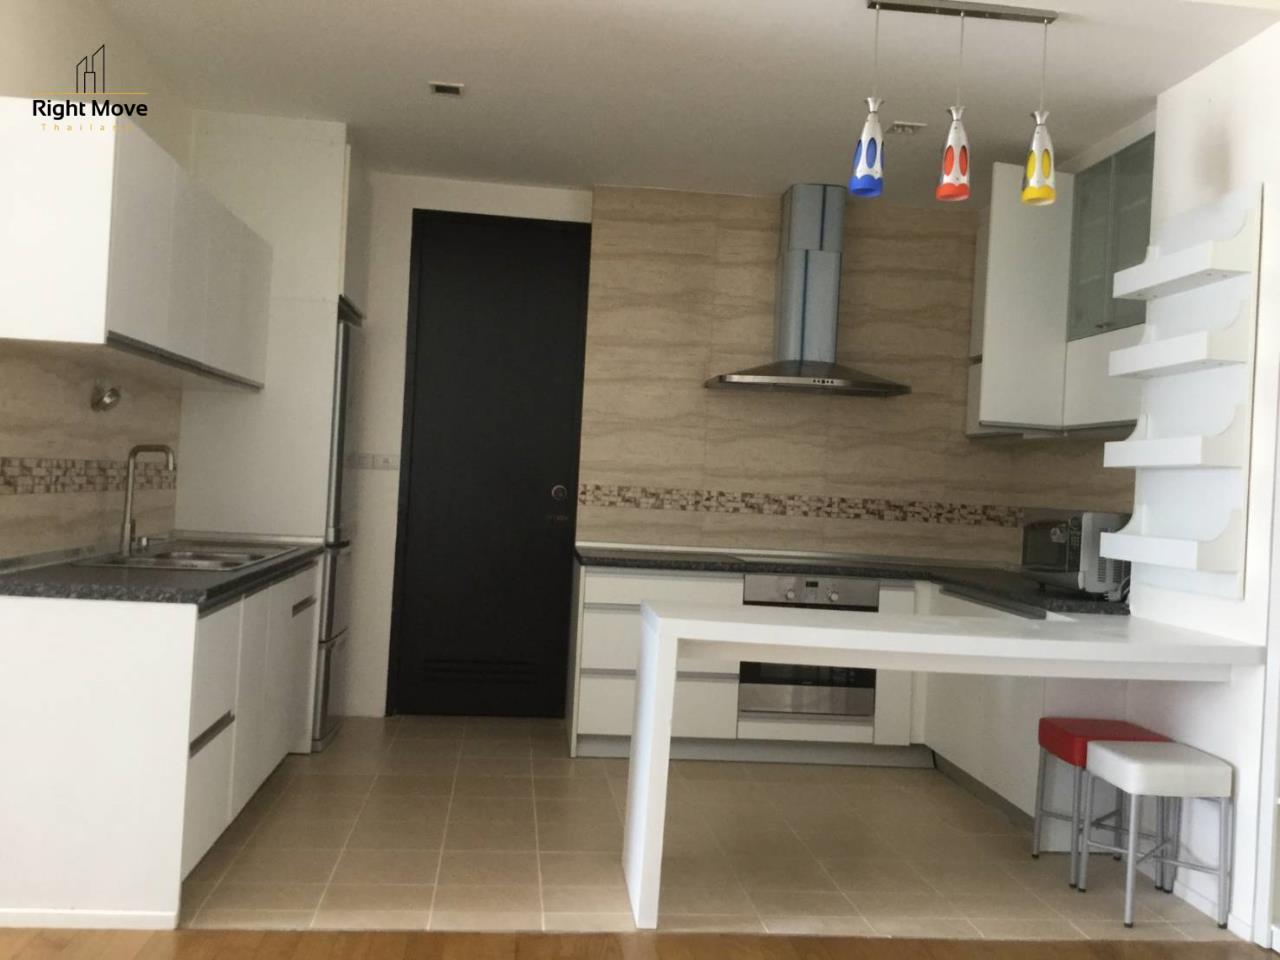 Right Move Thailand Agency's CA5486 Madison Condominium For Rent 90,000 THB - 3 Bedrooms - 160 sqm. 4